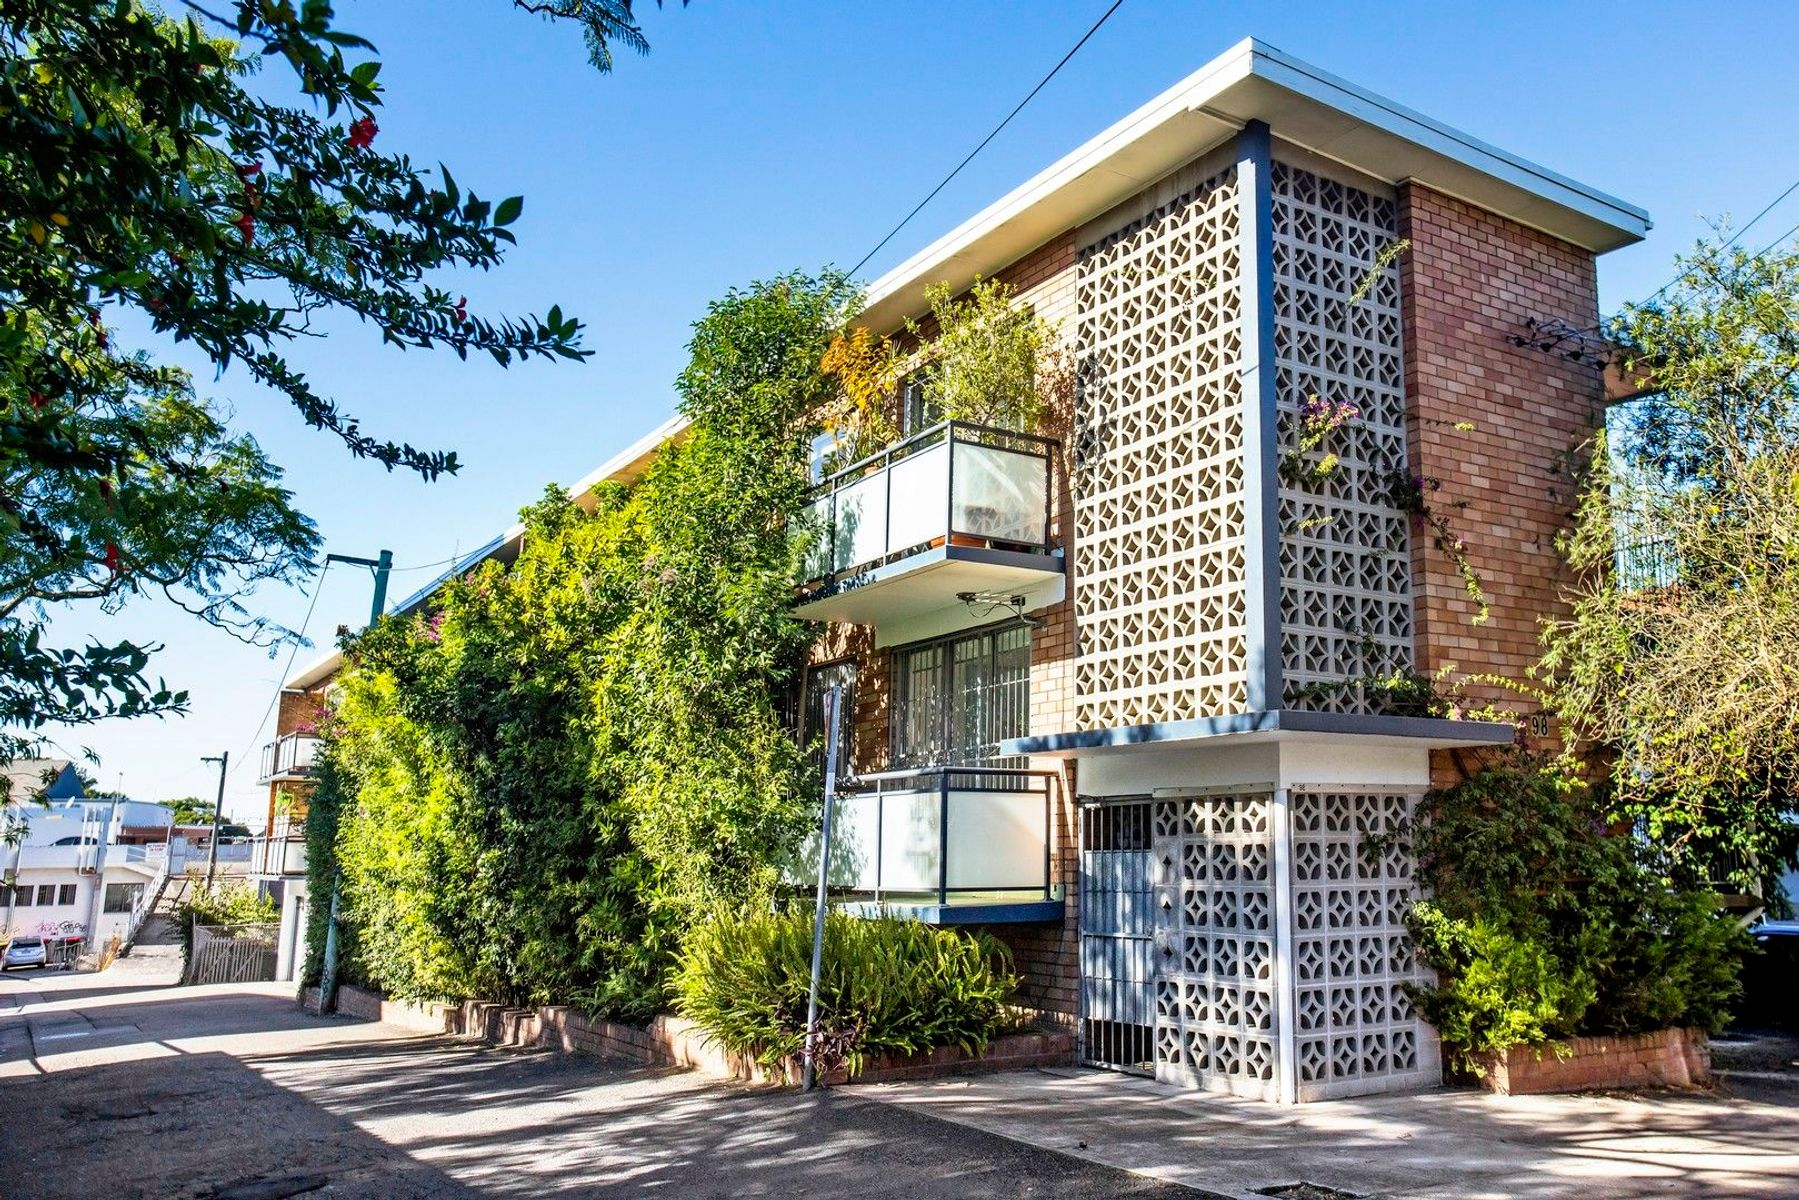 3/98 Petersham Road, Marrickville, NSW 2204